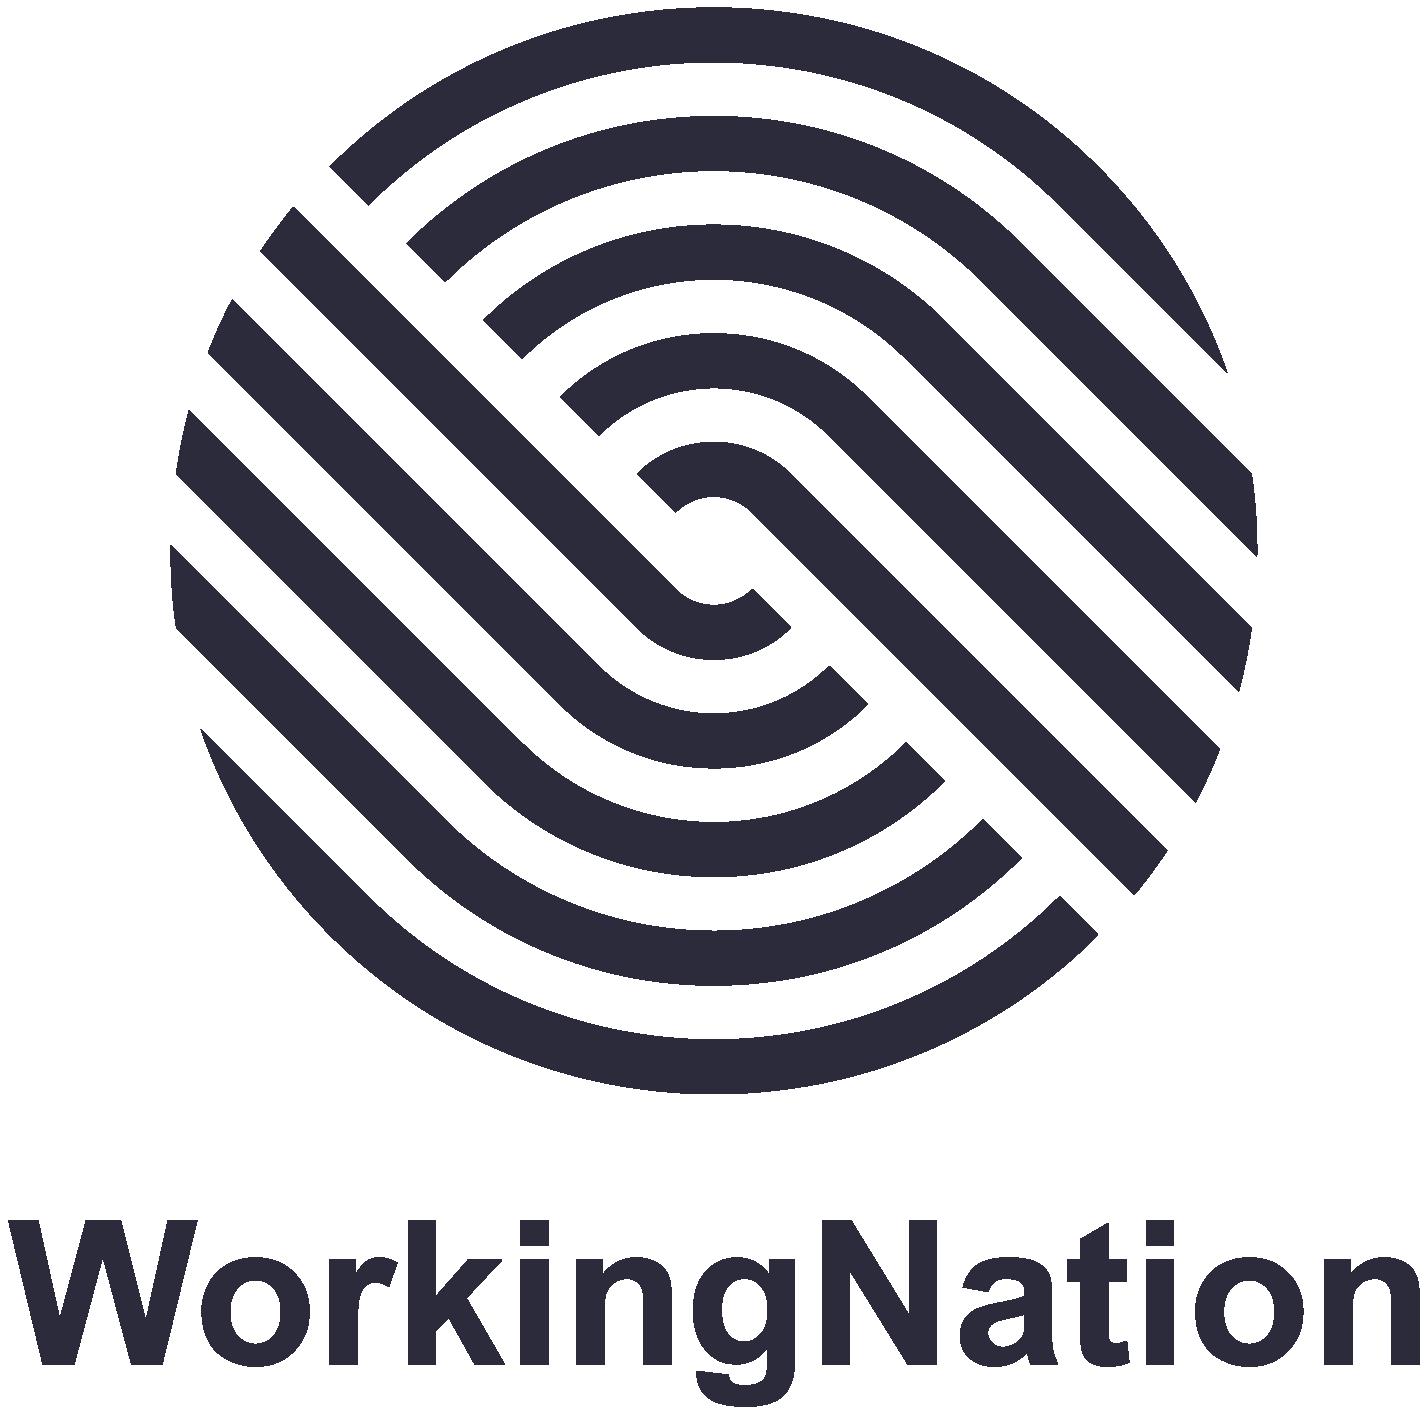 WorkingNation